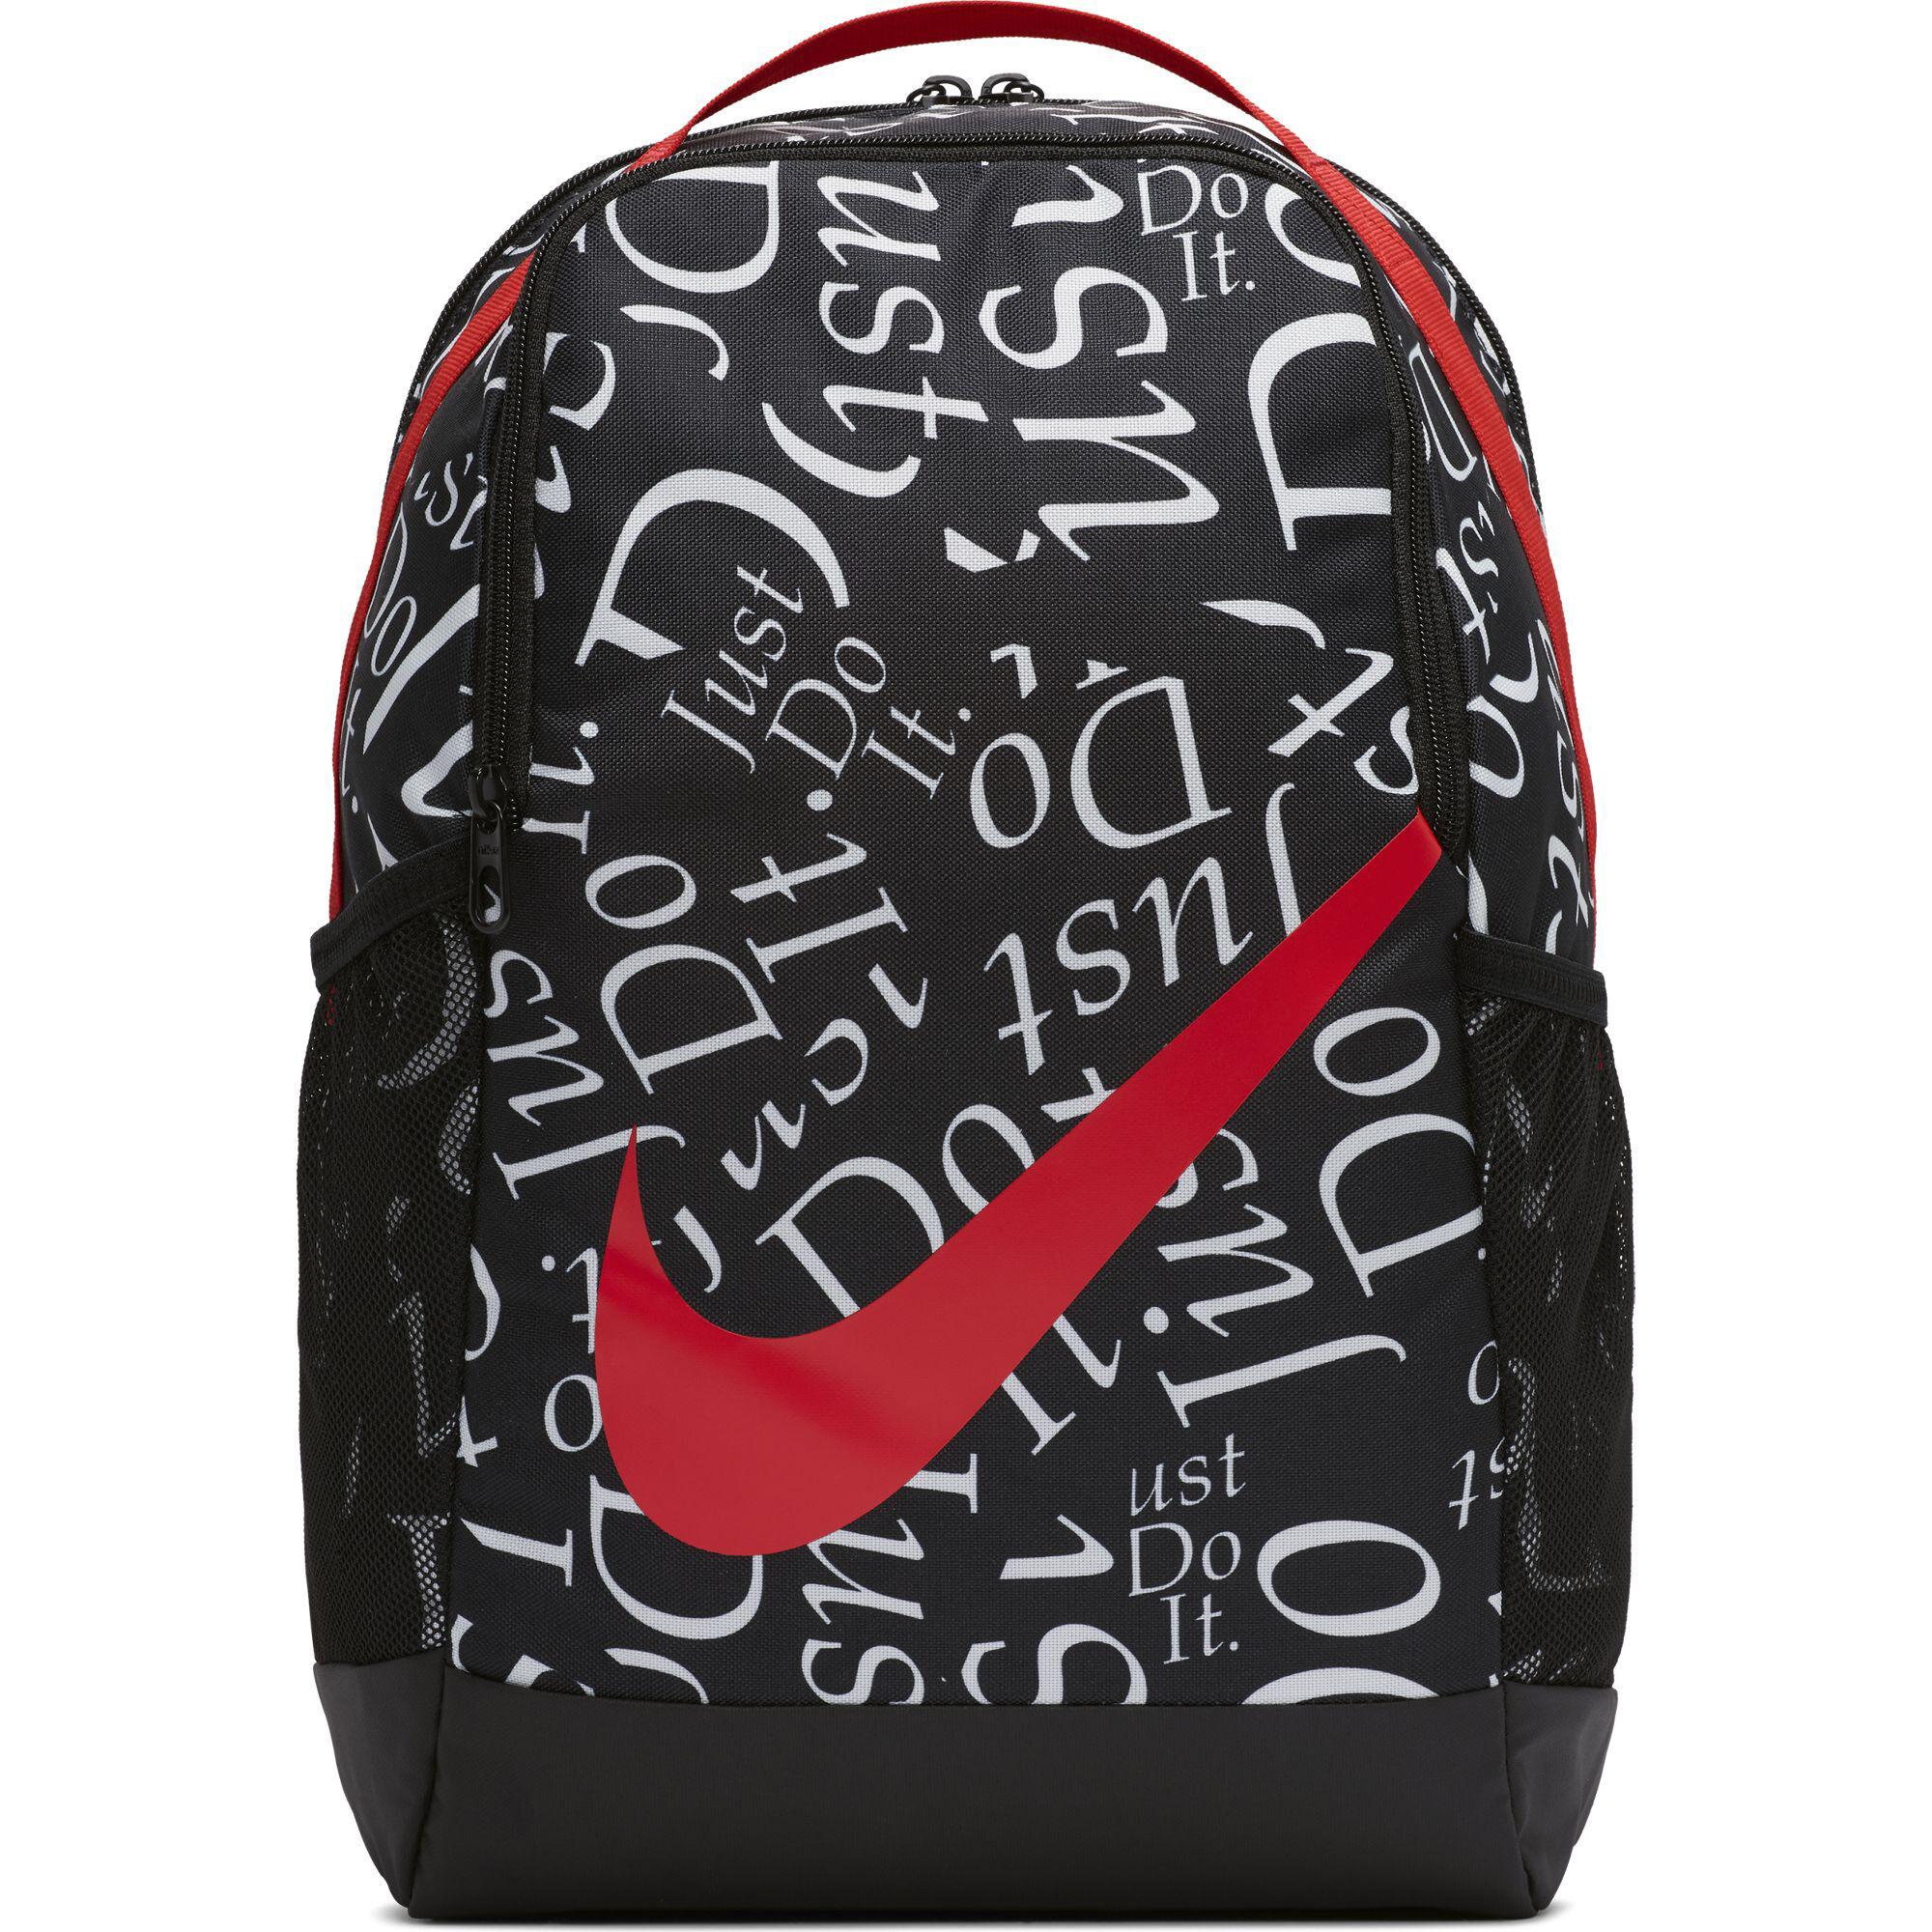 Backpacks | Accessories at SHOE SHOW MEGA